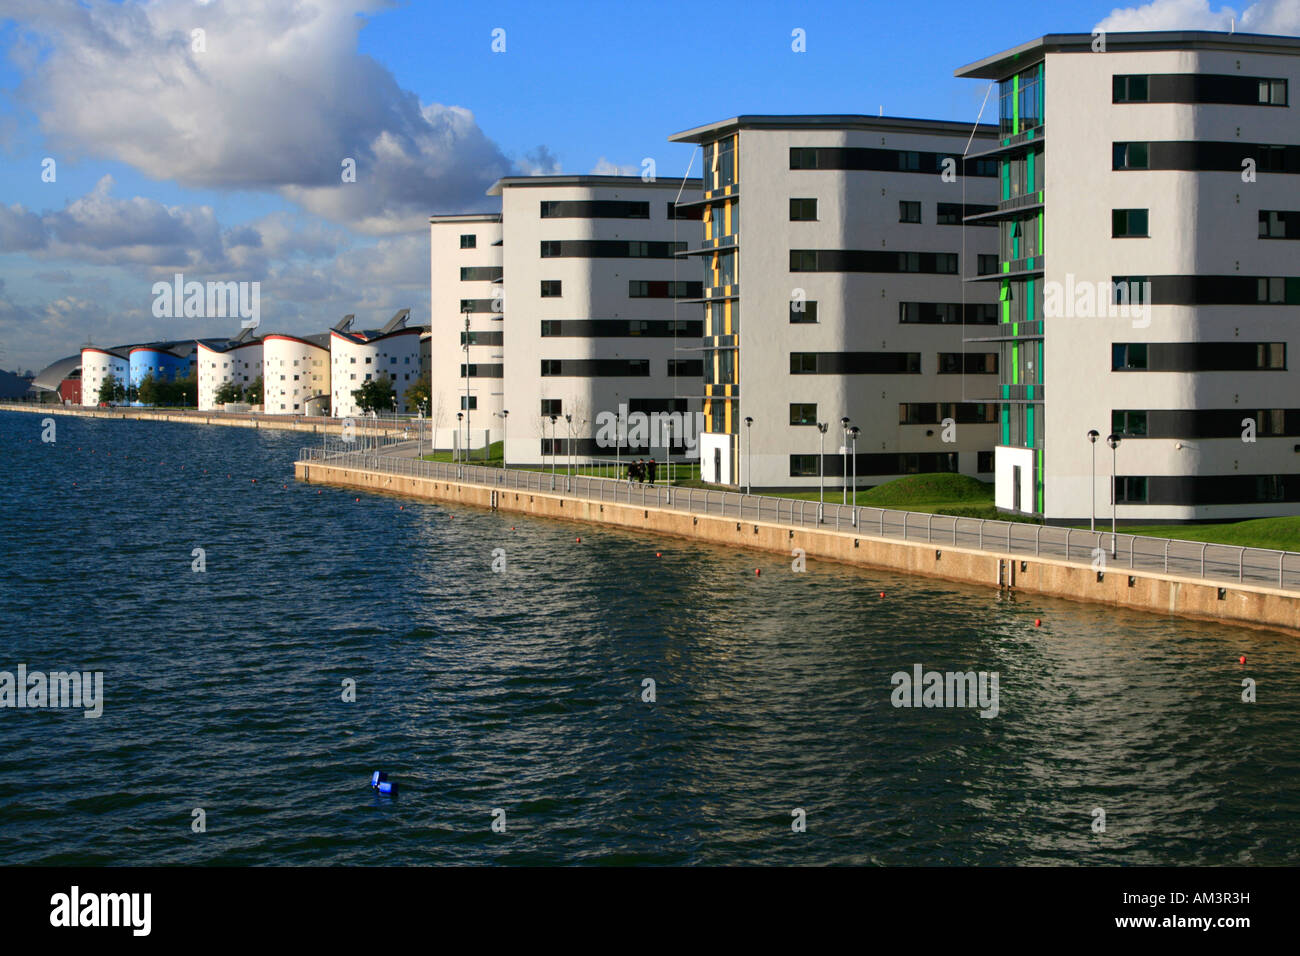 royal albert docks university way new build london england uk gb